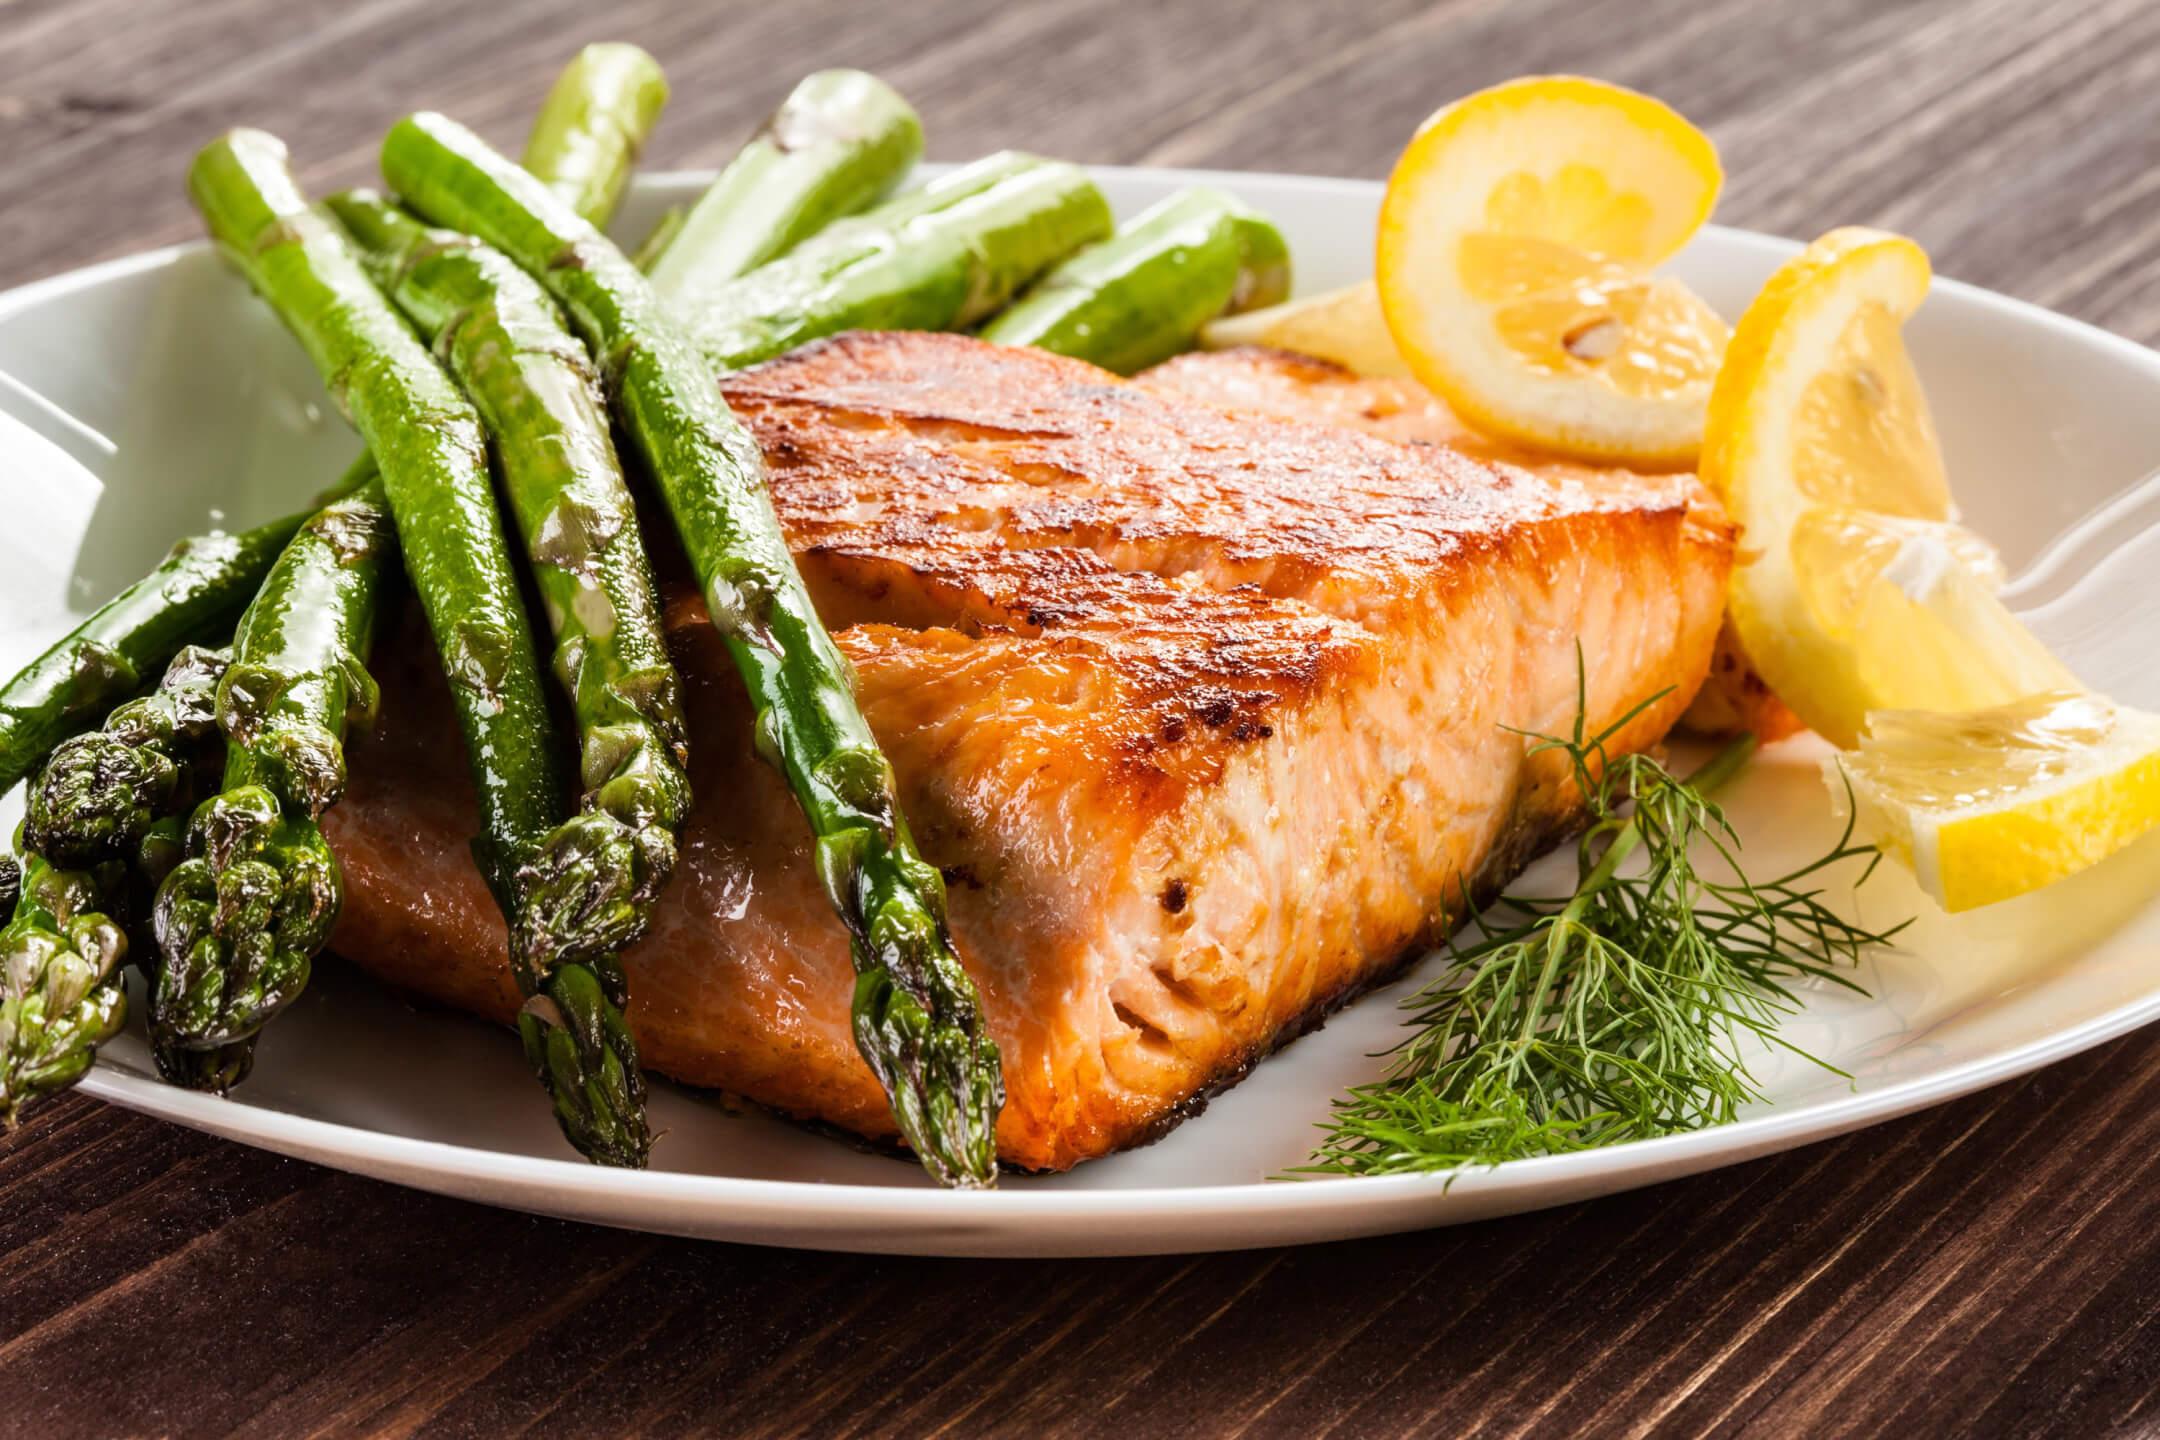 lemon dill salmon for ziptop recipe